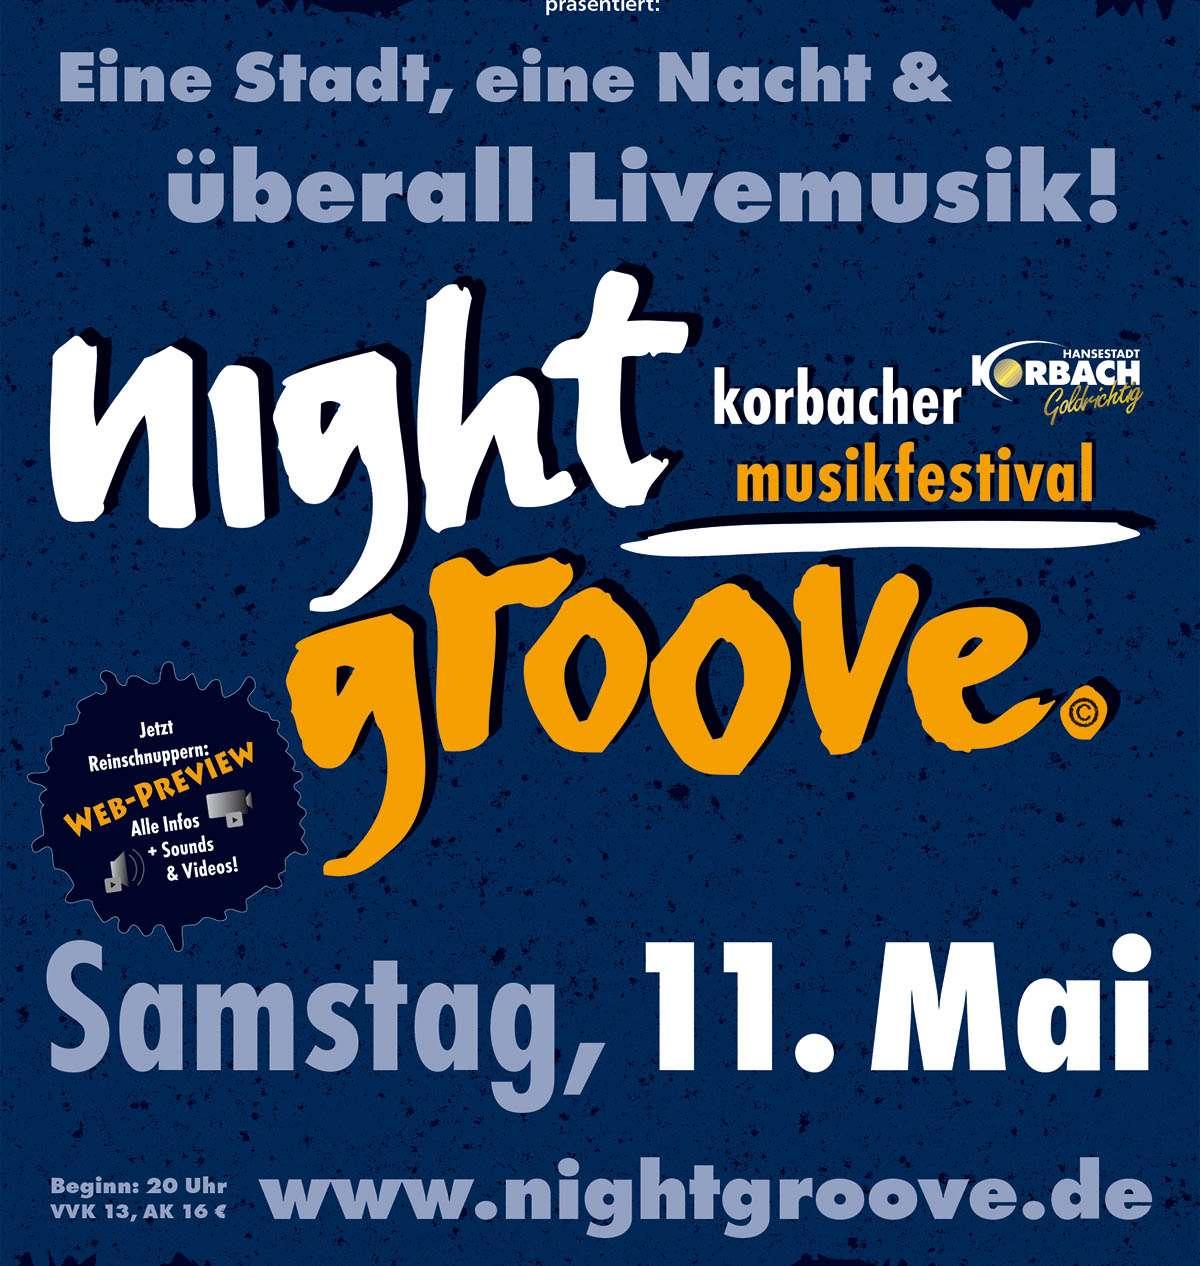 Nightgroove - JustBrill! - Bühne Obermarkt - Korbach